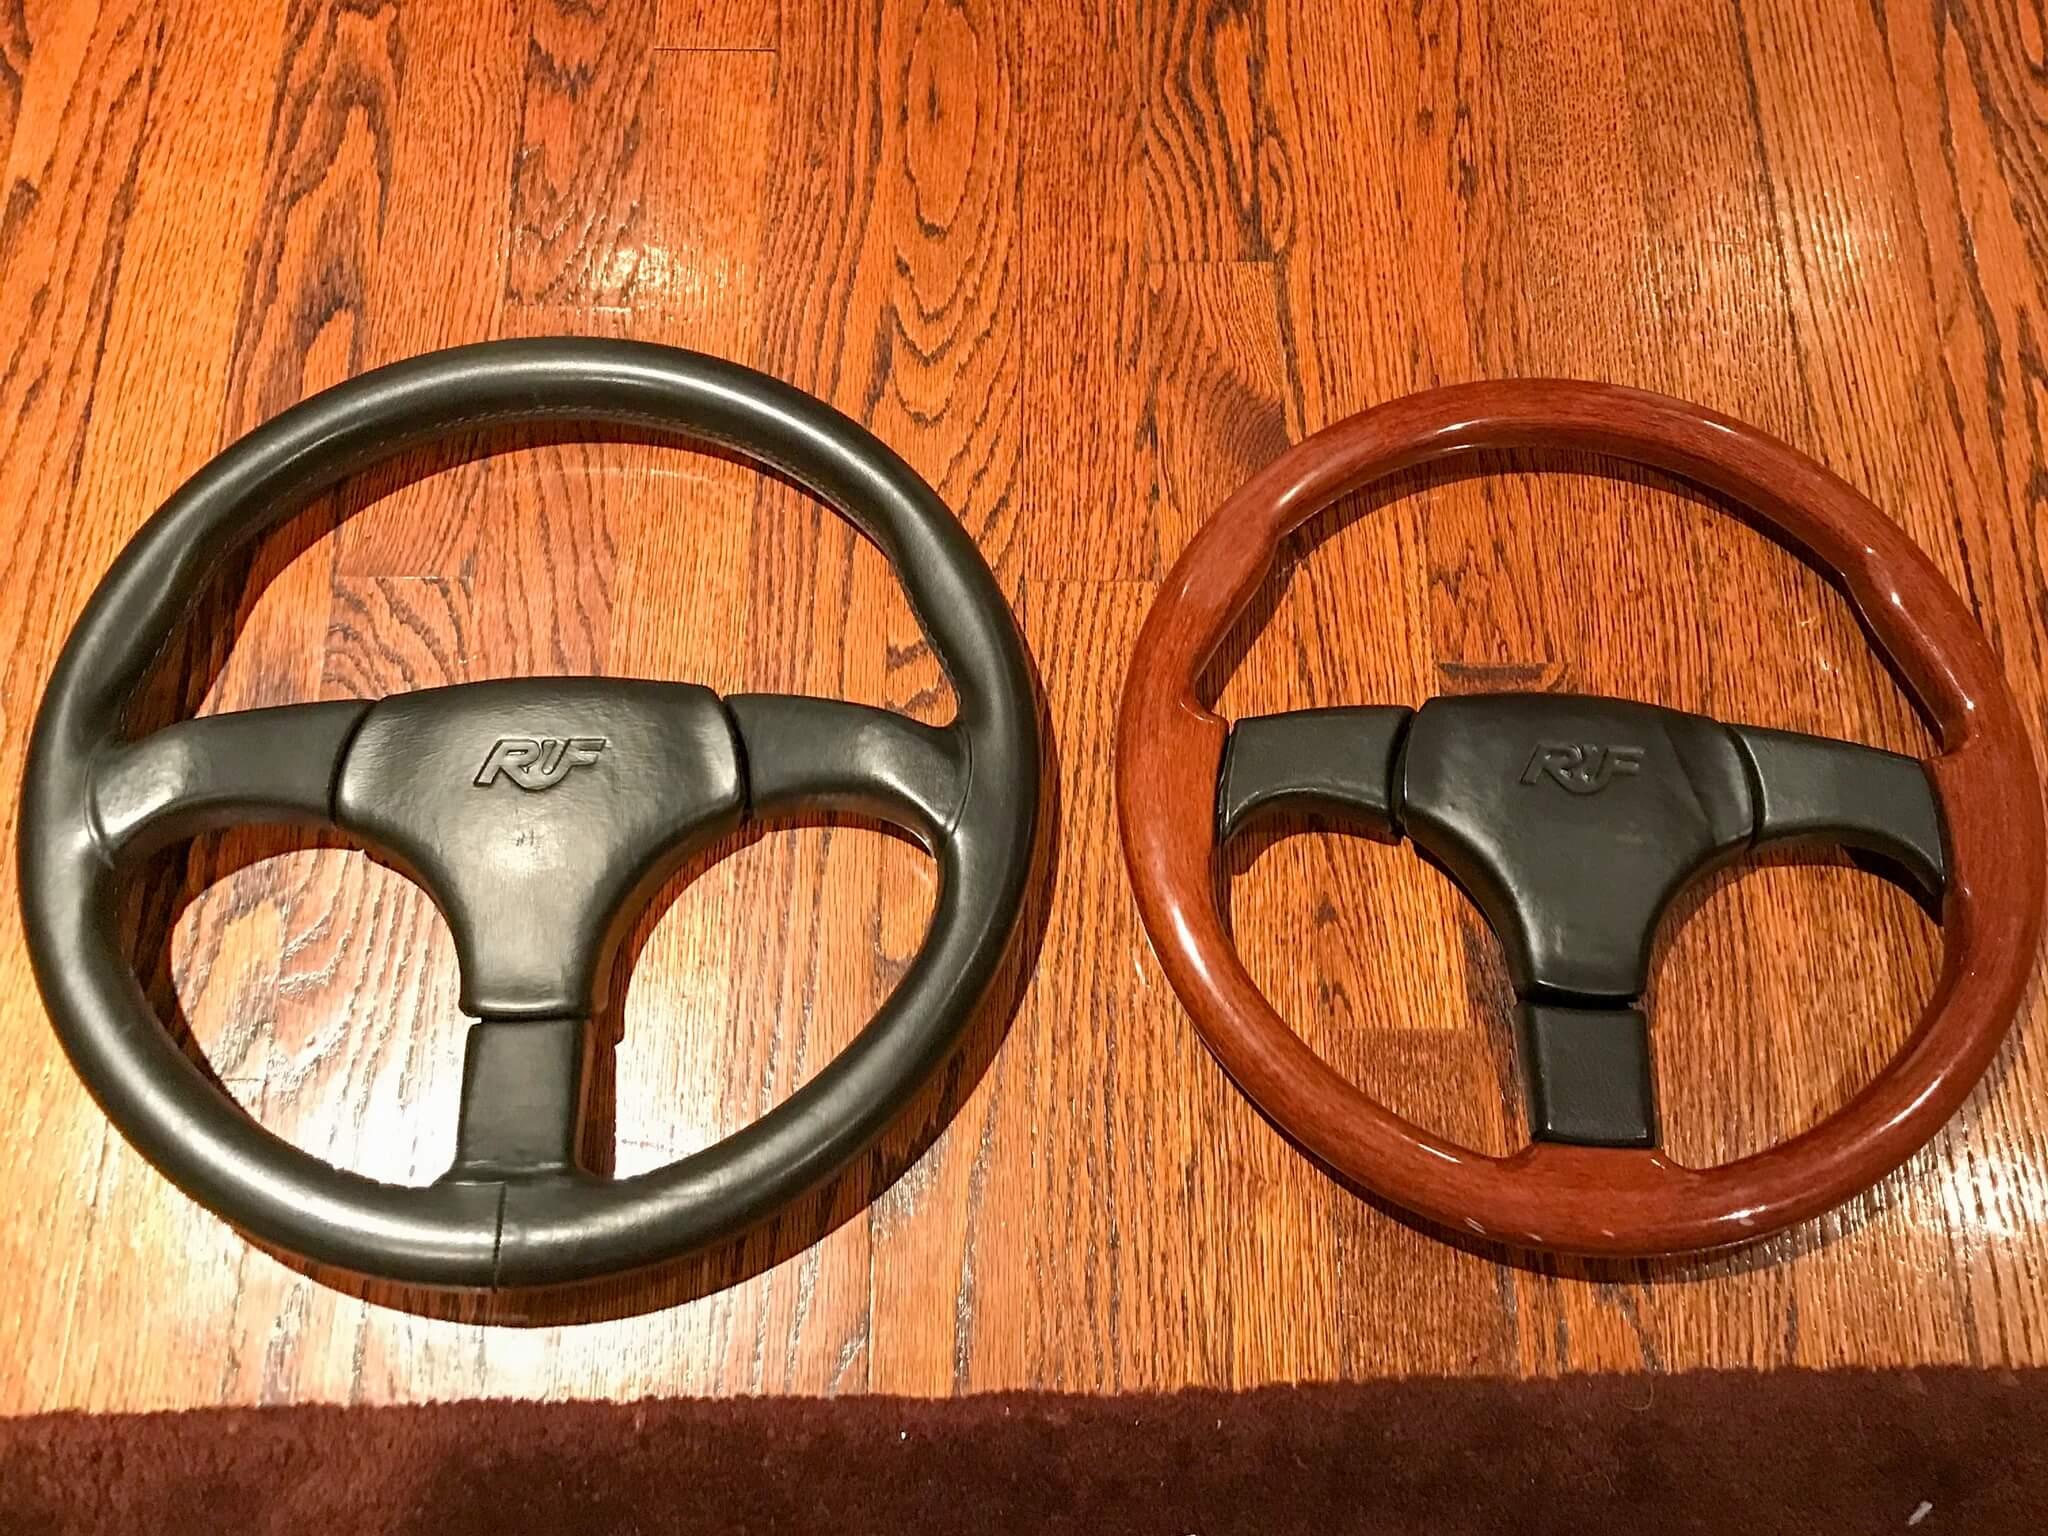 RUF Steering Wheels by Atiwe with Eccentric Hub